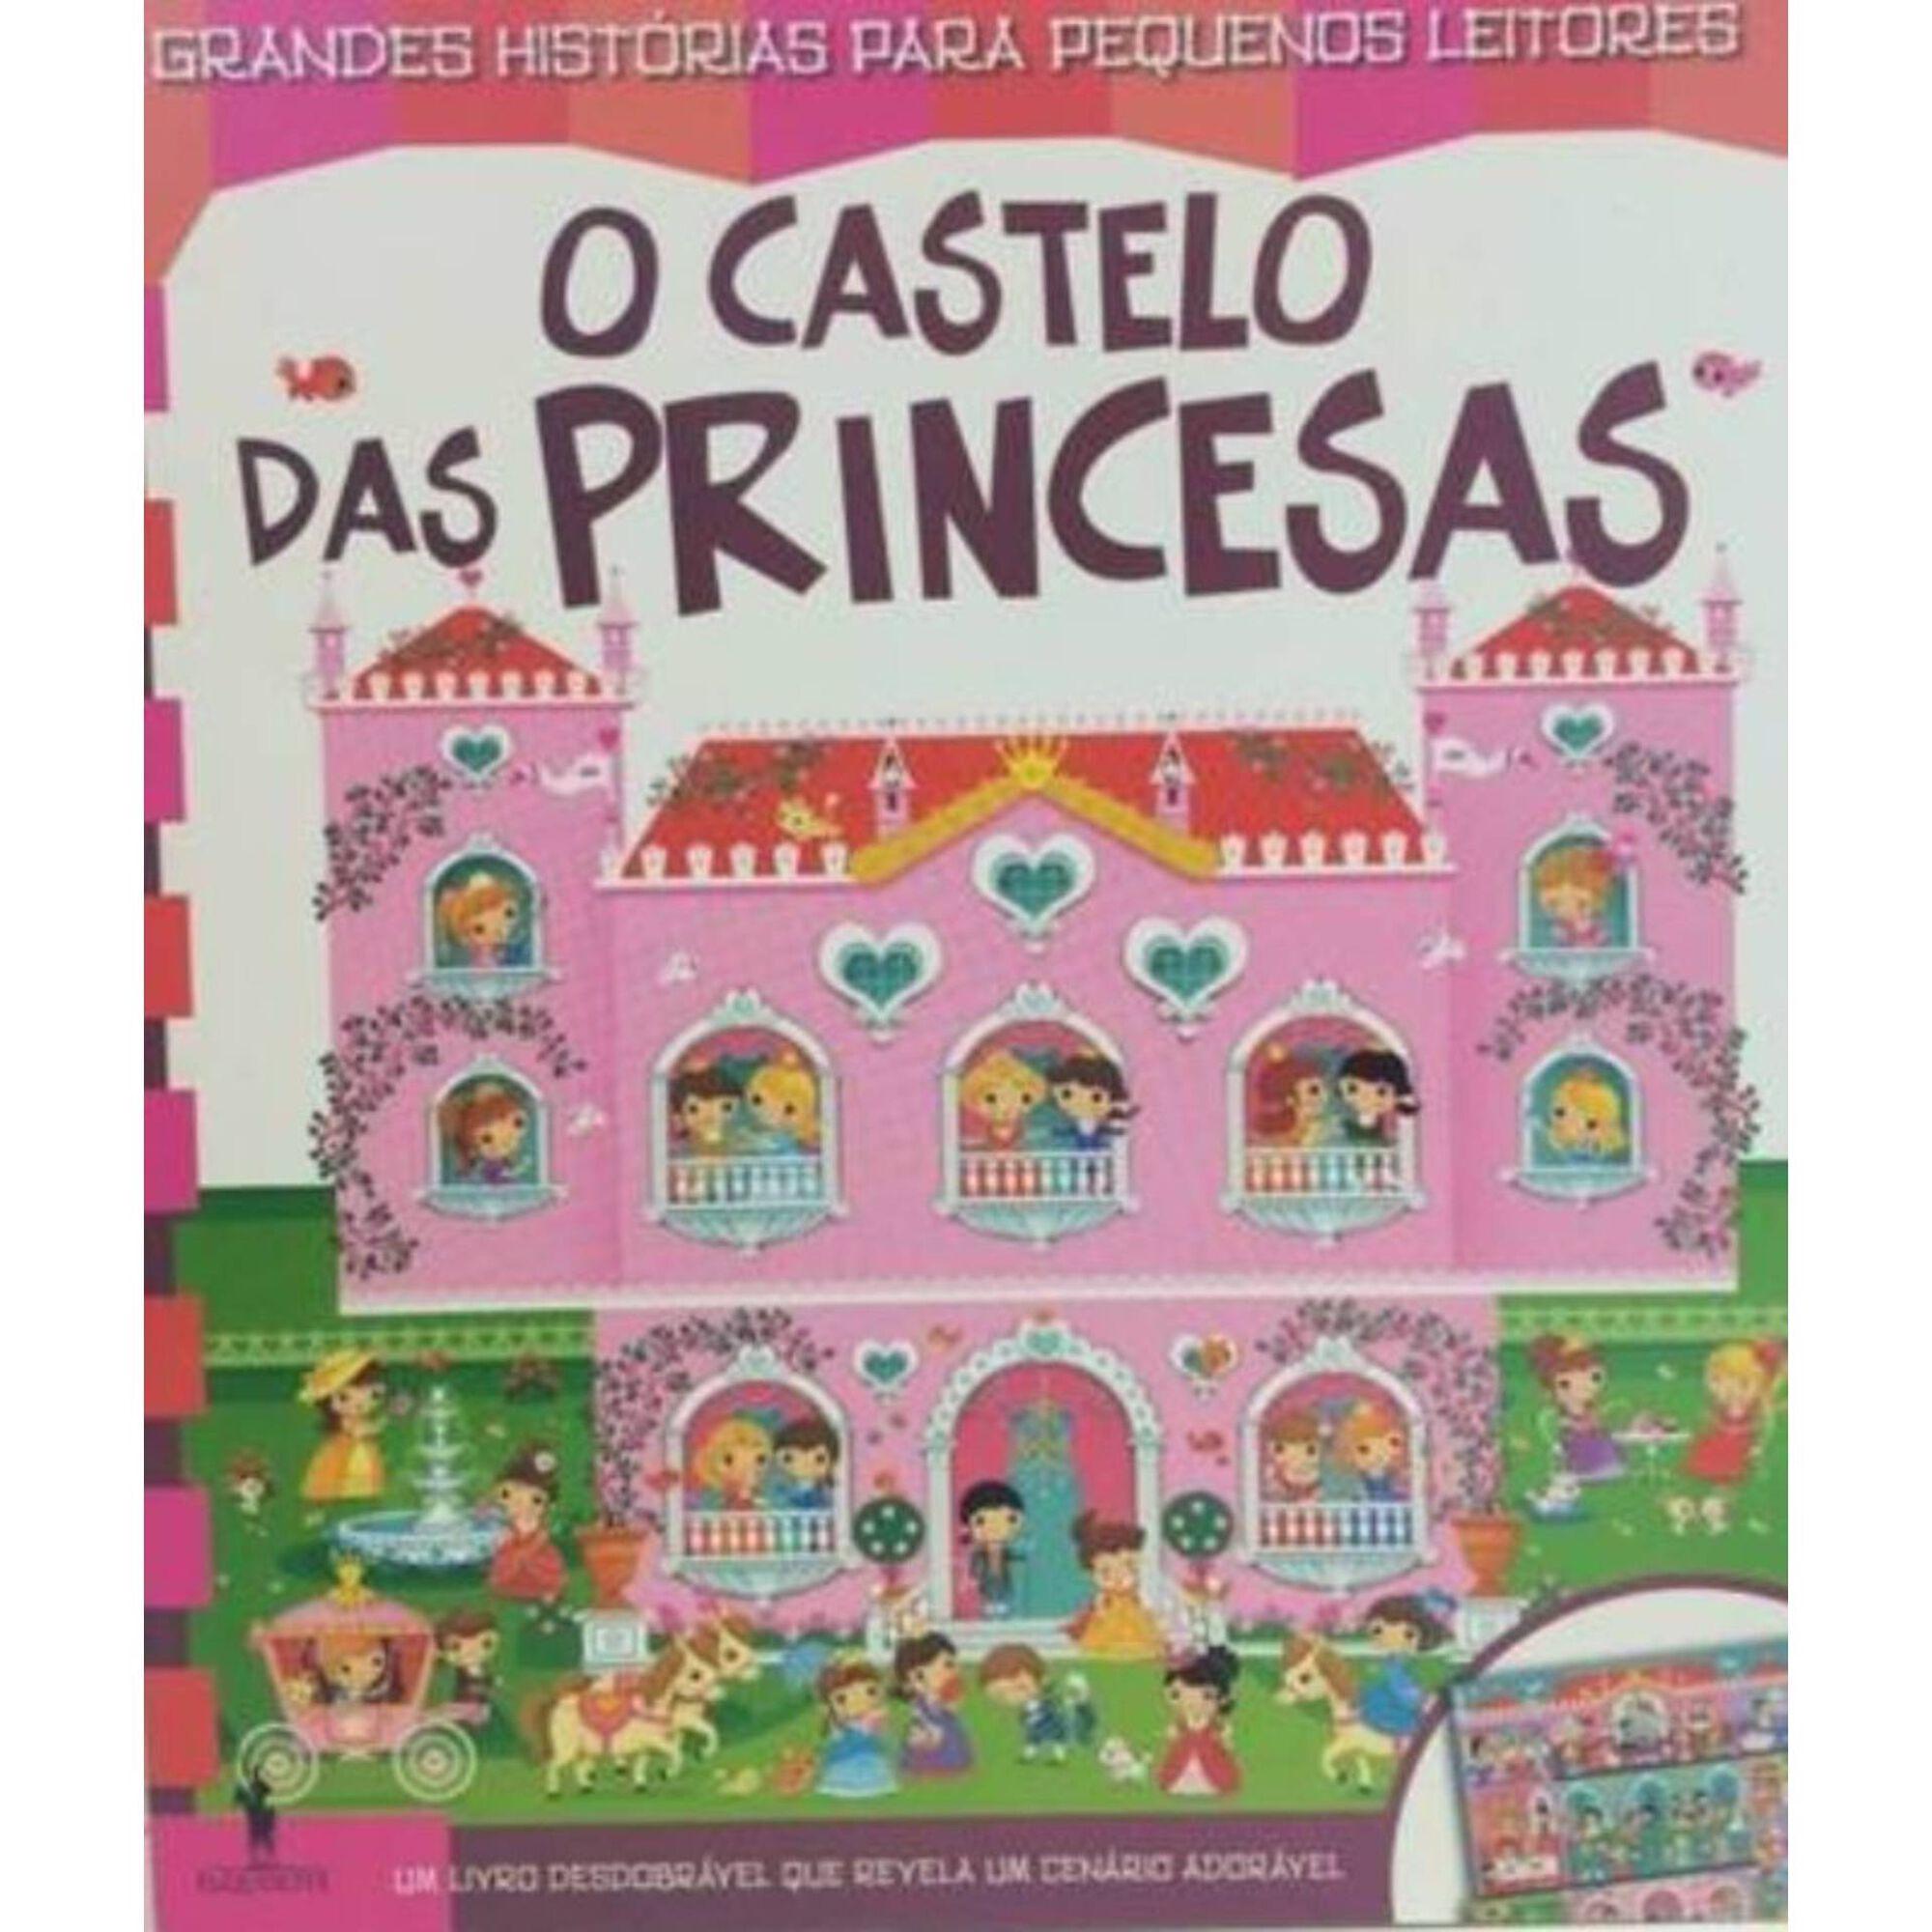 O Castelo das Princesas